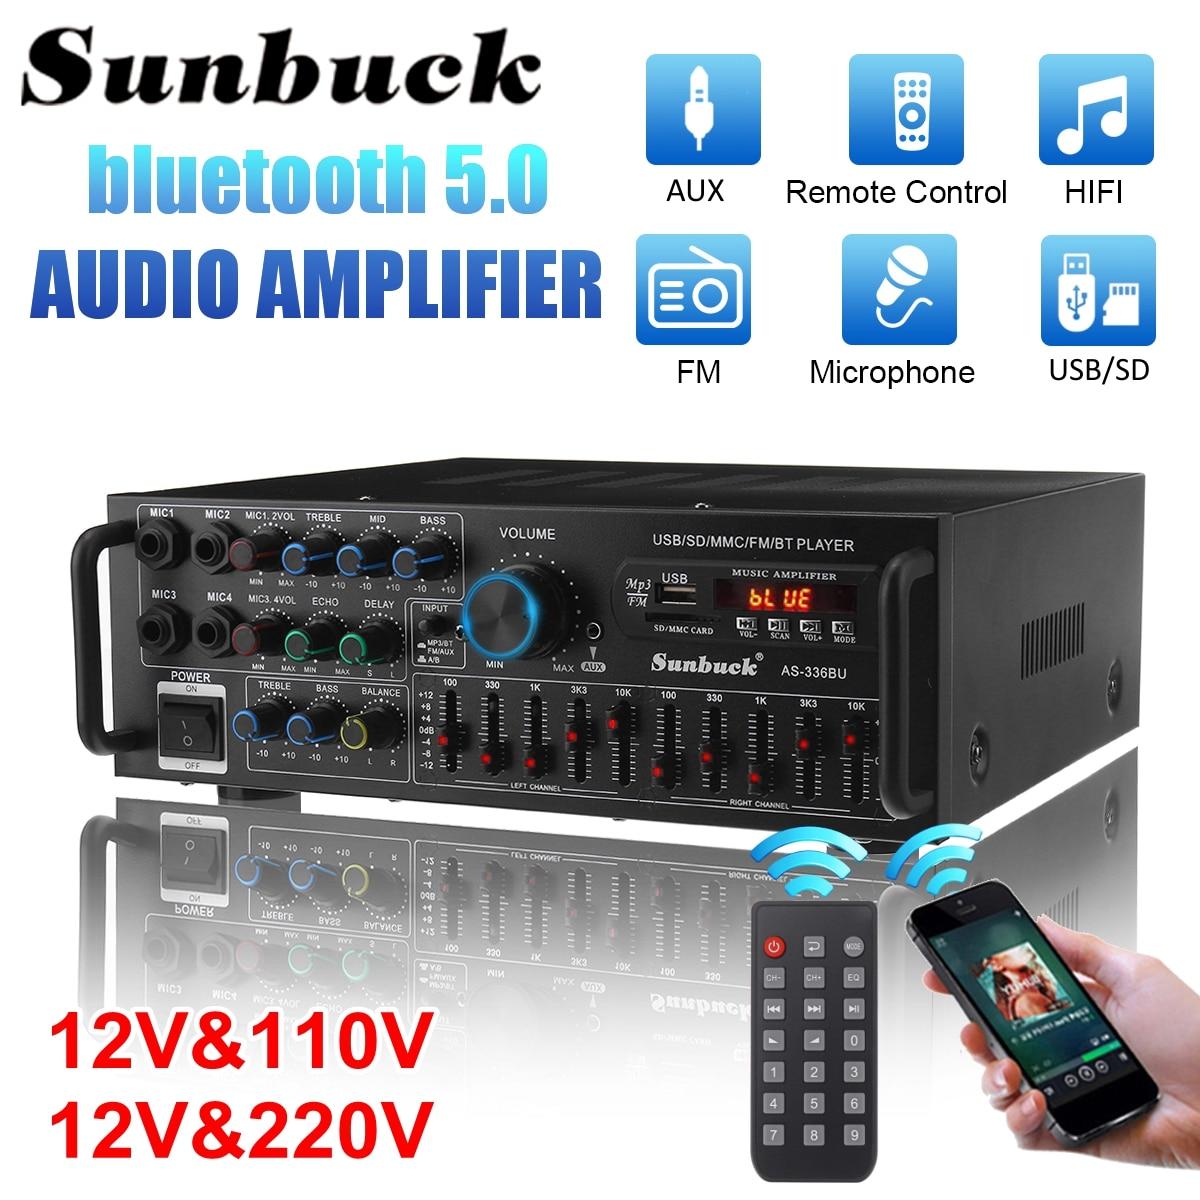 SUNBUCK 2000 واط بلوتوث مكبر صوت استيريو الصوت المحيطي USB SD أمبير FM DVD AUX شاشة الكريستال السائل السينما المنزلية كاريوكي التحكم عن بعد